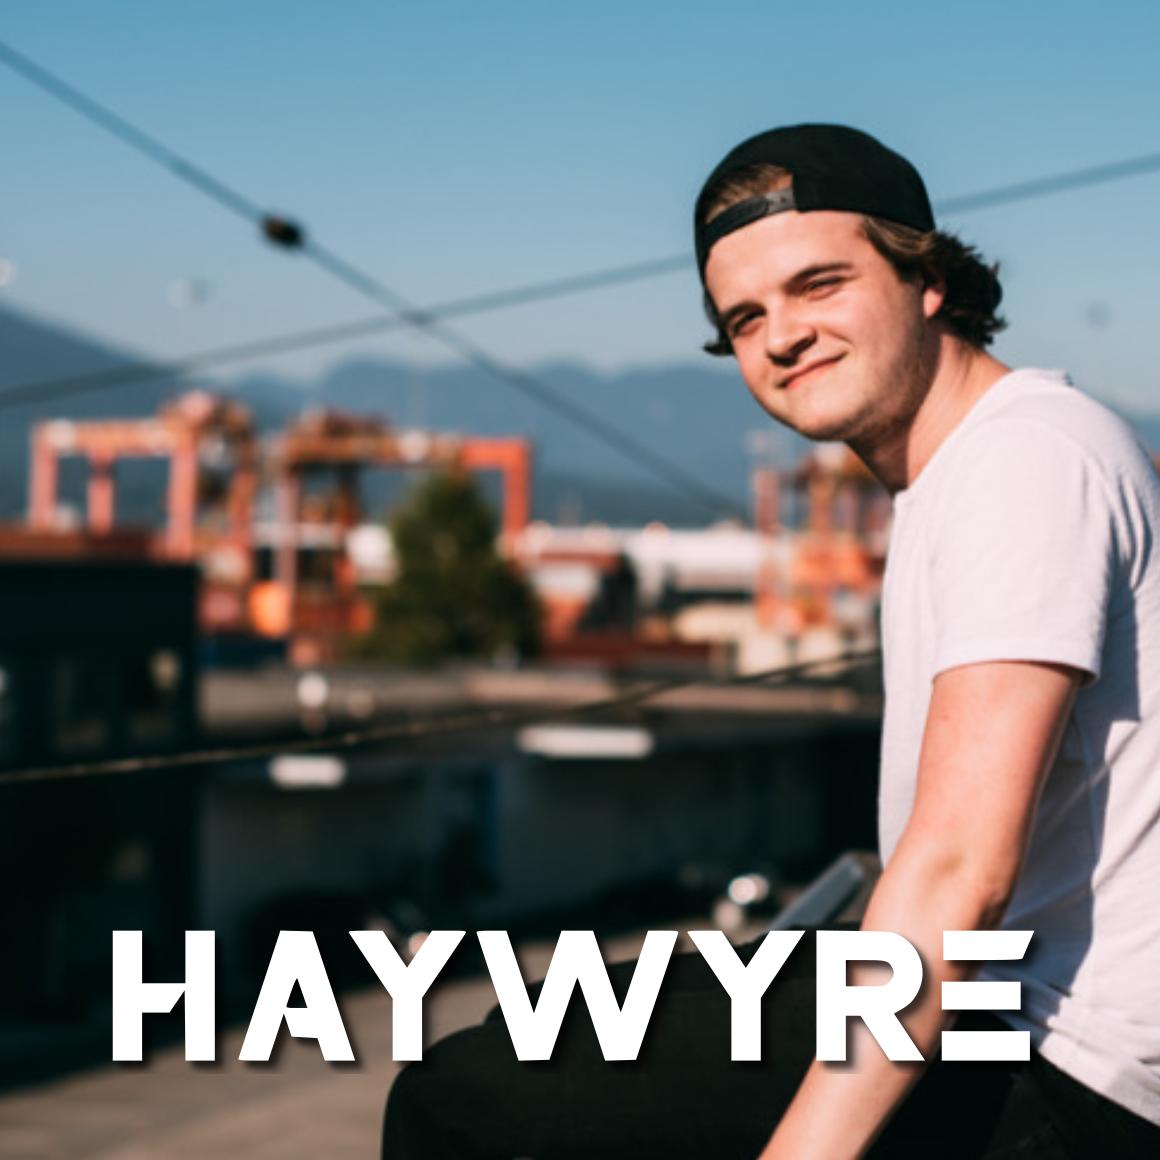 Haywyre-Nest-Stage-Headliner-Electric-Love-Festival-2017